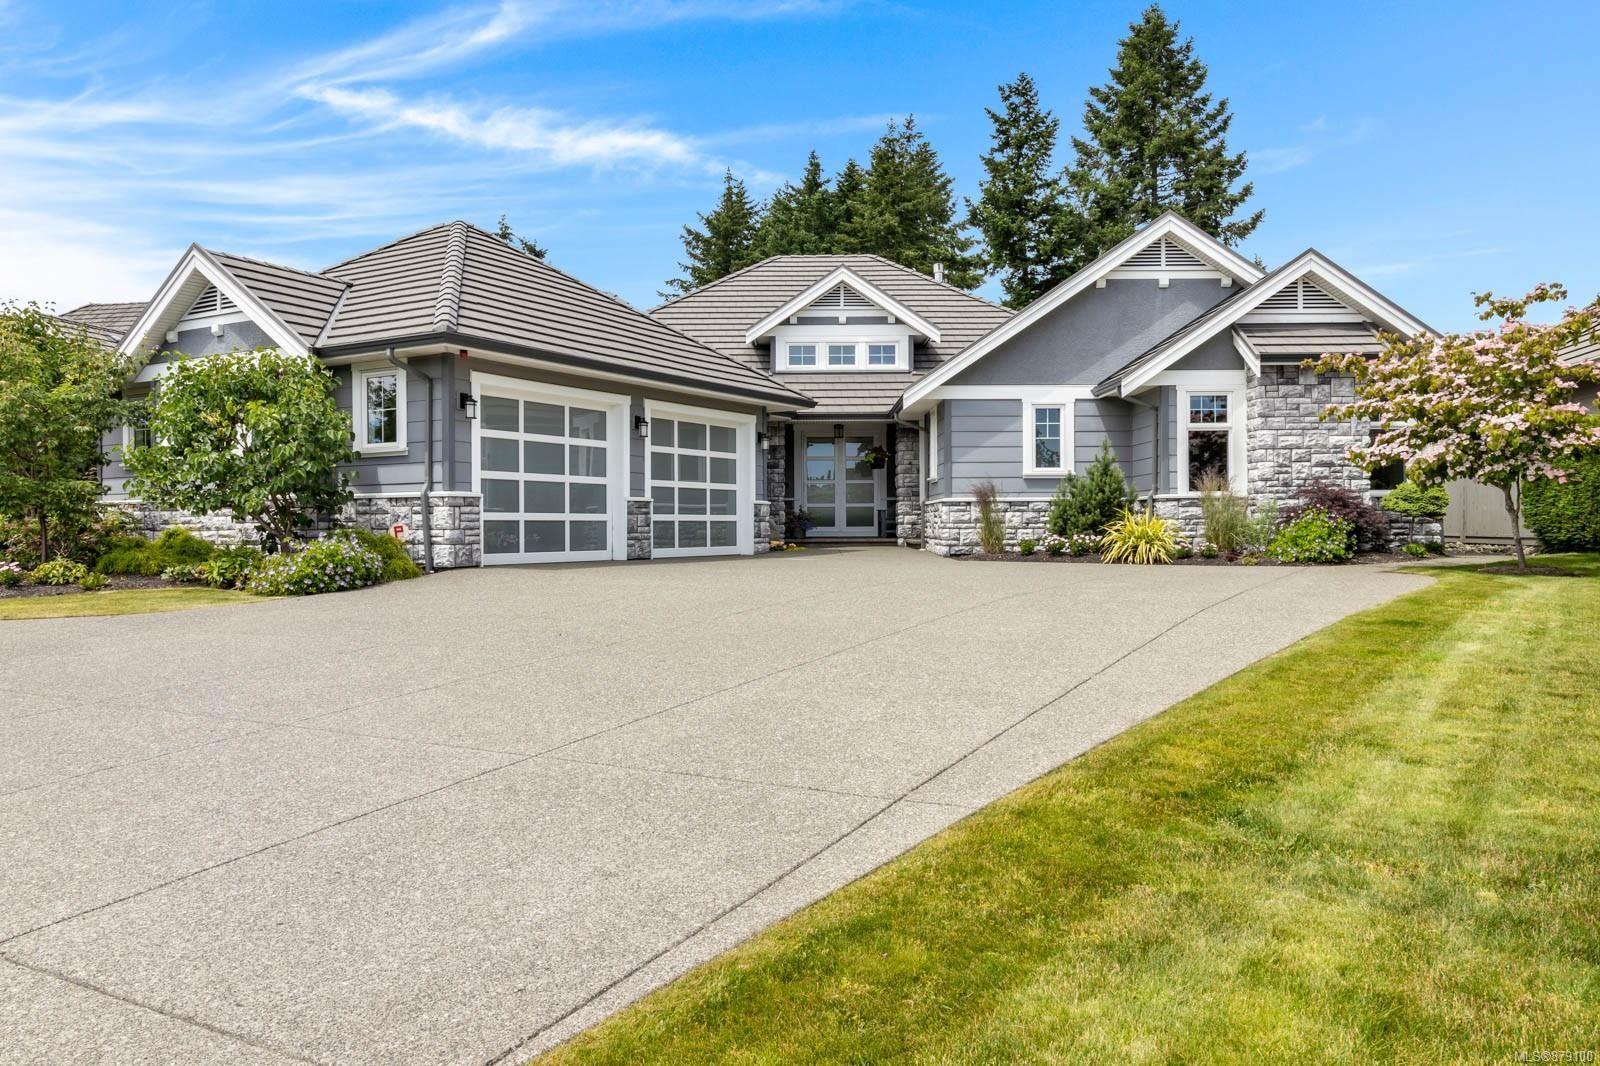 Main Photo: 3630 Royal Vista Way in : CV Crown Isle House for sale (Comox Valley)  : MLS®# 879100